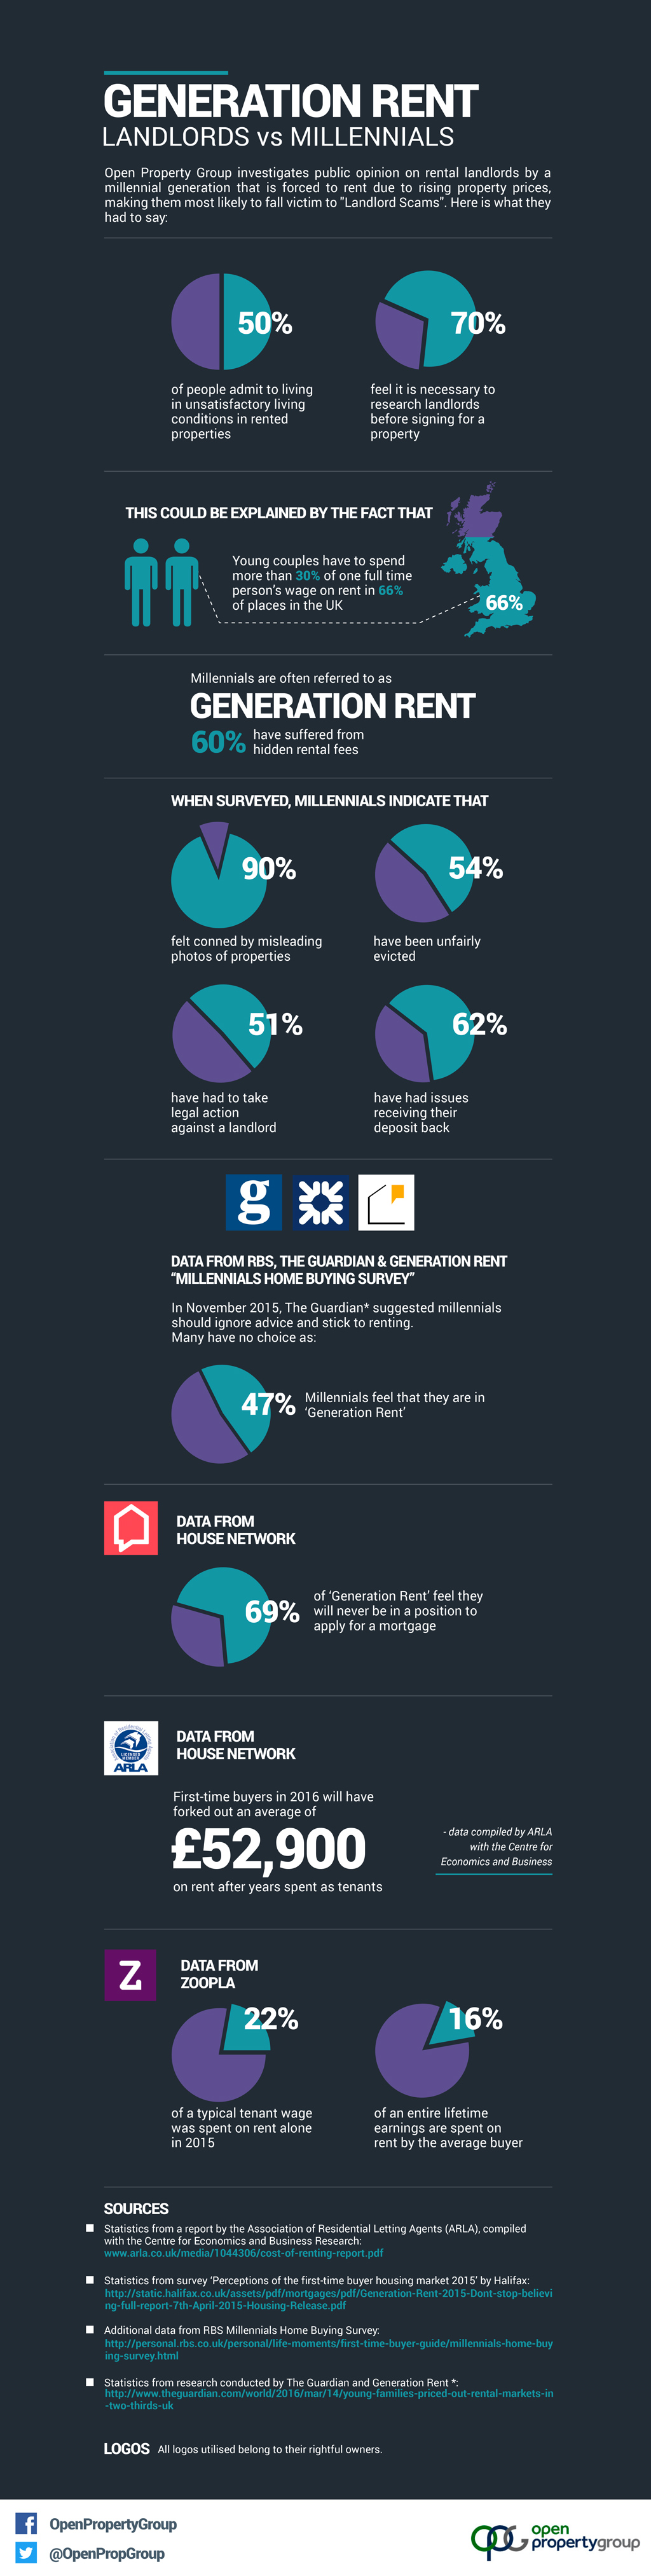 Generation Rent - Landlords vs Millennials